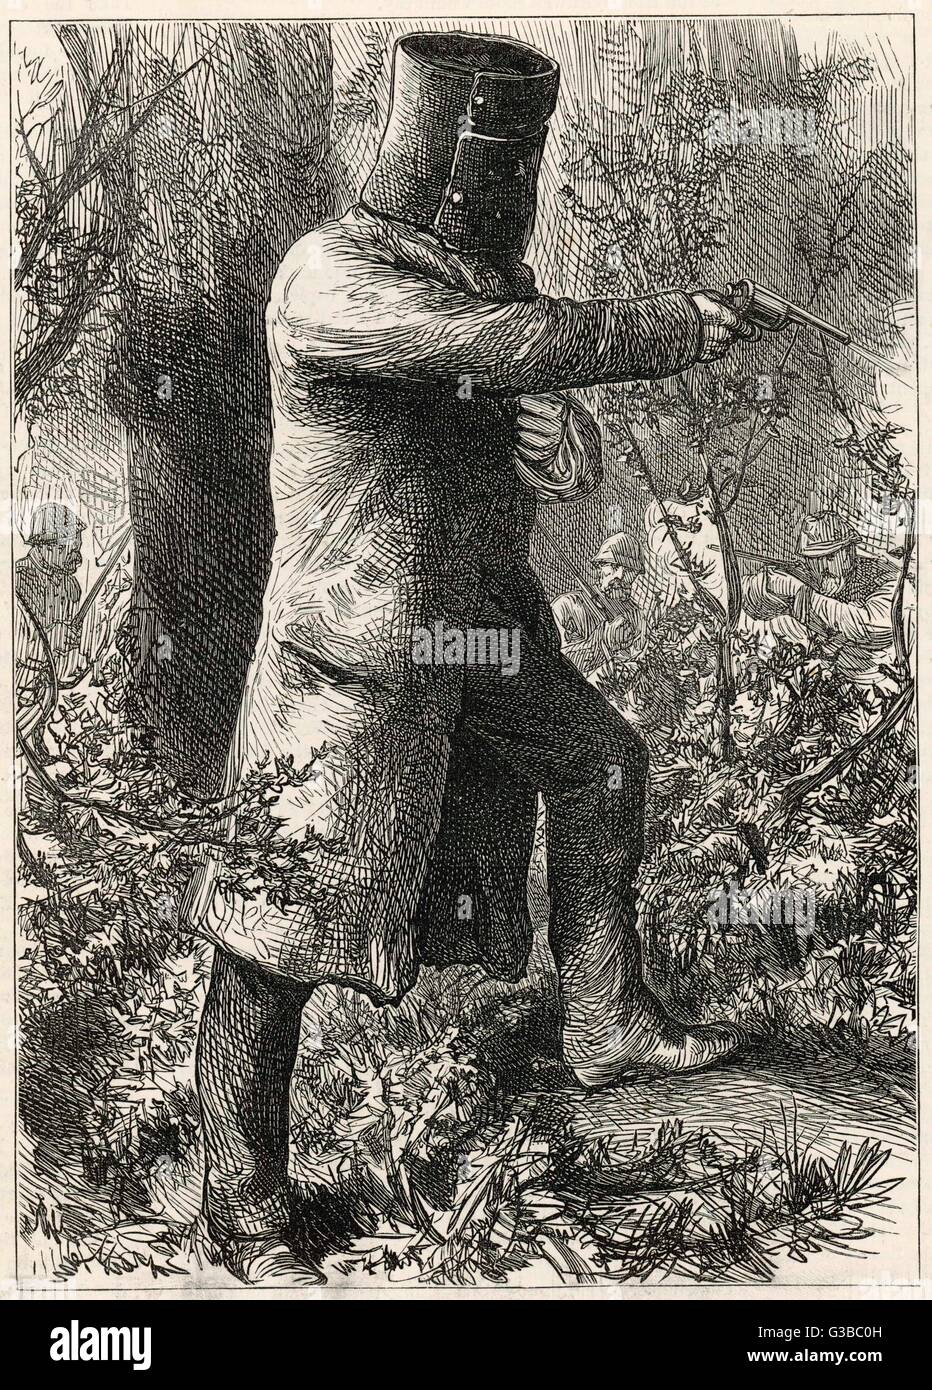 Ned Kelly, légende australienne, fait son dernier combat. Date: 1880 Photo Stock